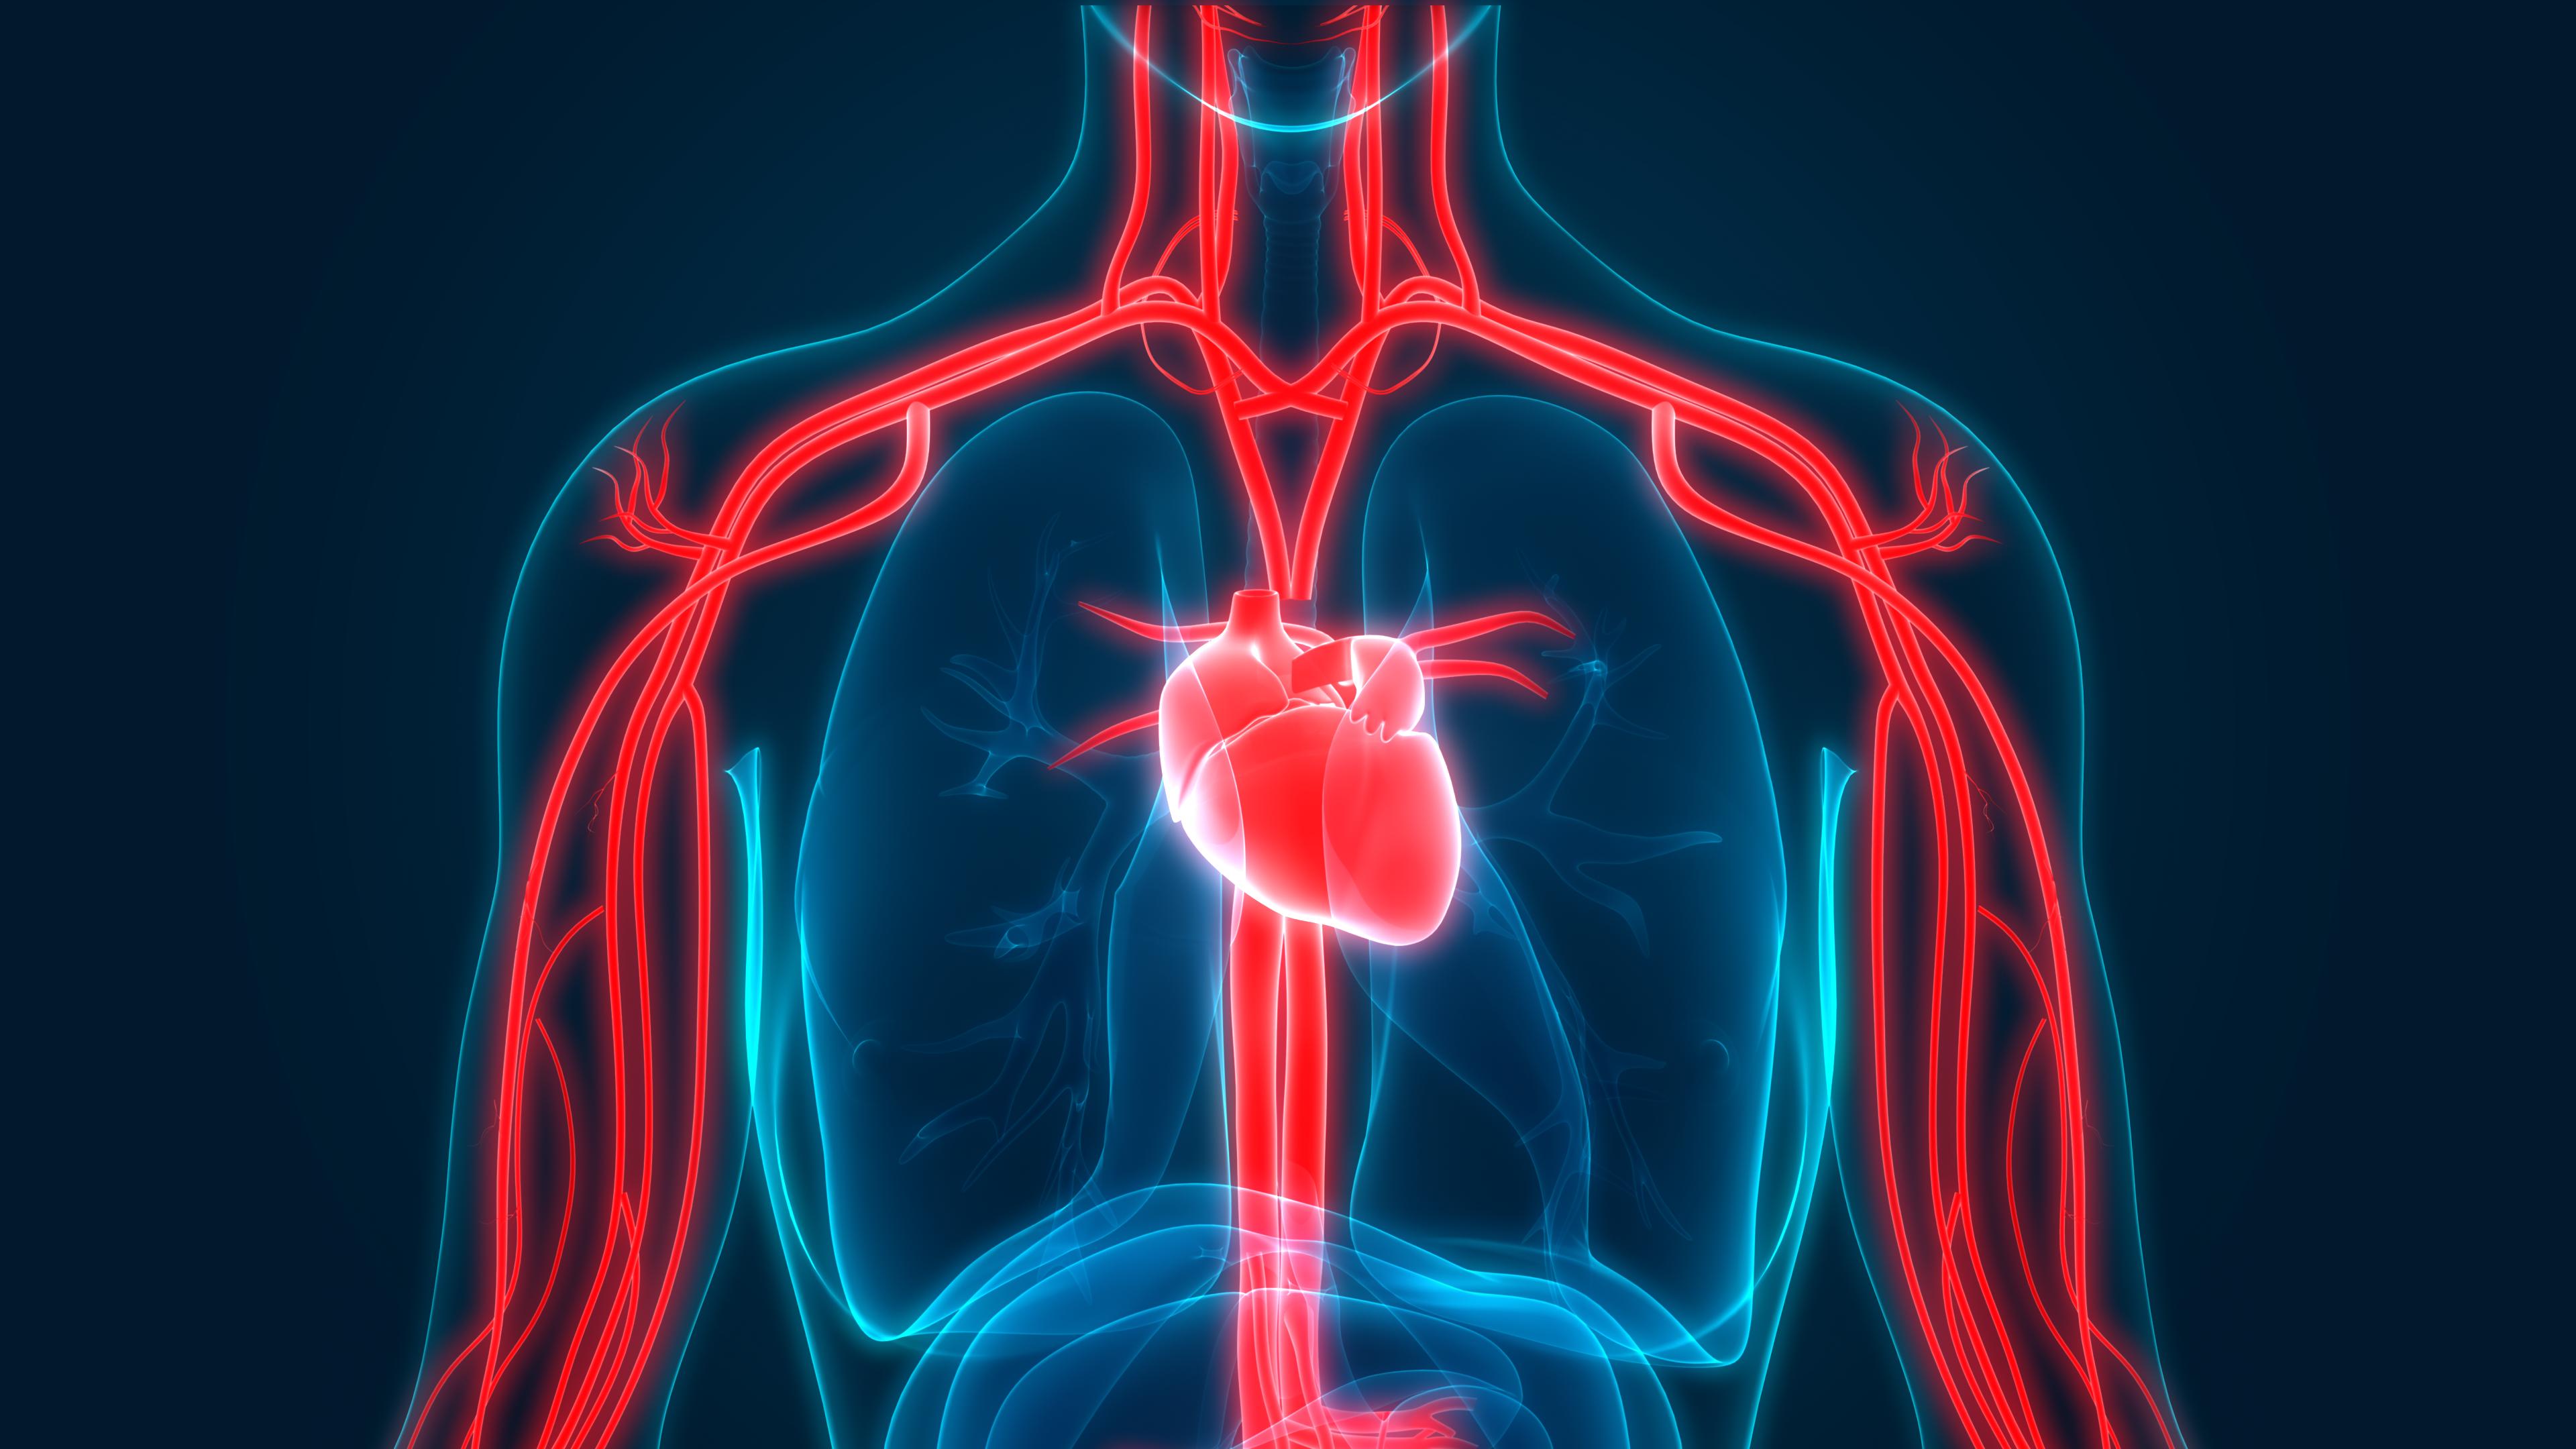 3D Illustration of Human Circulatory System Anatomy